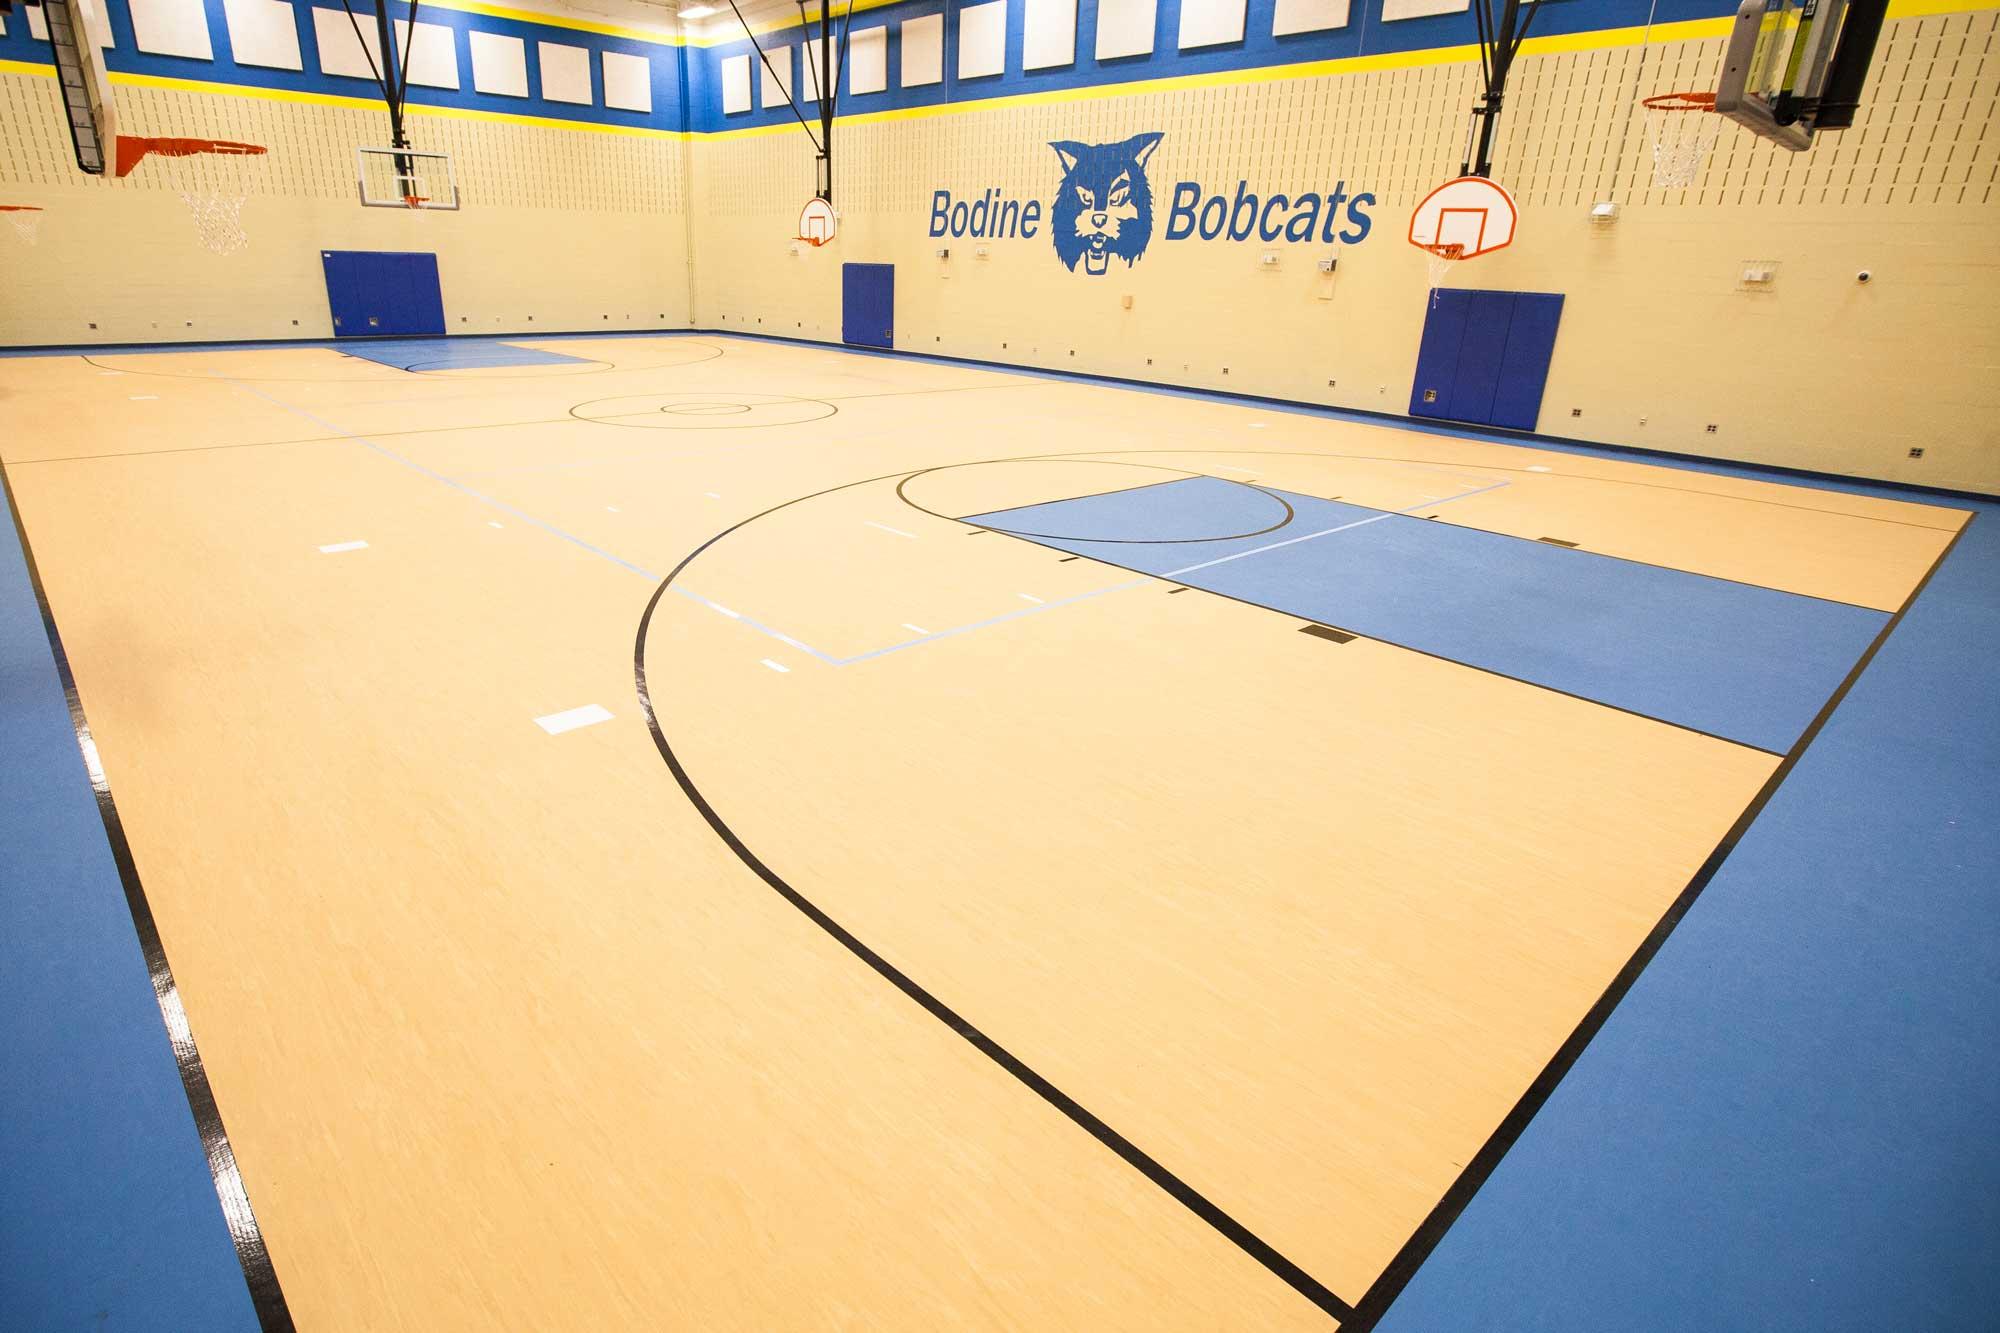 Bodine Elementary School,  Oklahoma City, Oklahoma, USA